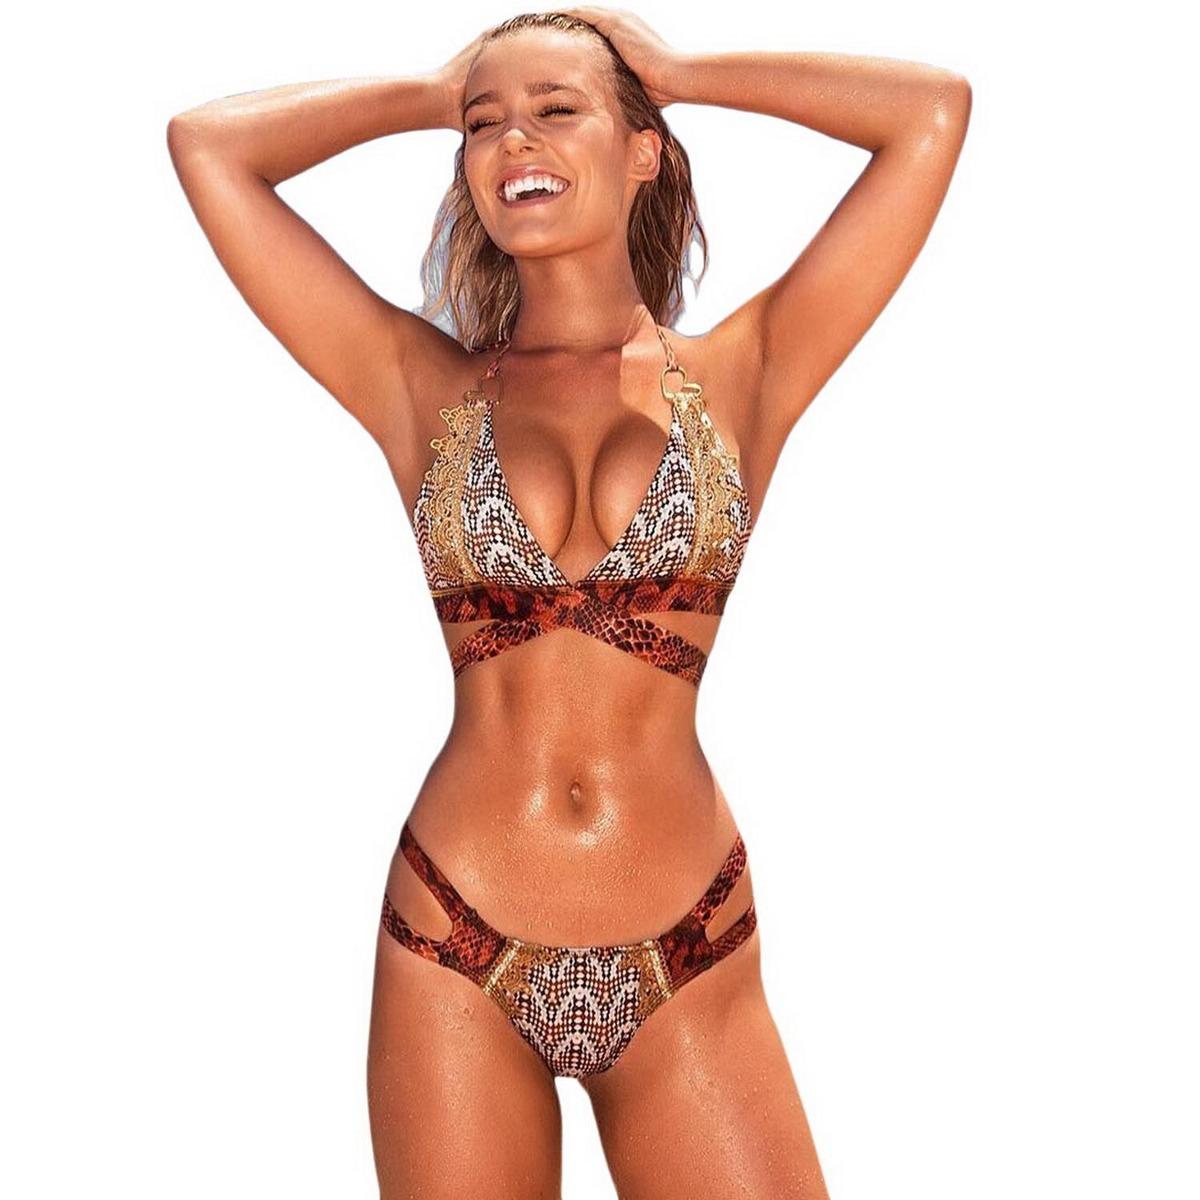 Dama Up Cruzado Bikini De Push Playa Impresión Baño Trajes uPiOXZk